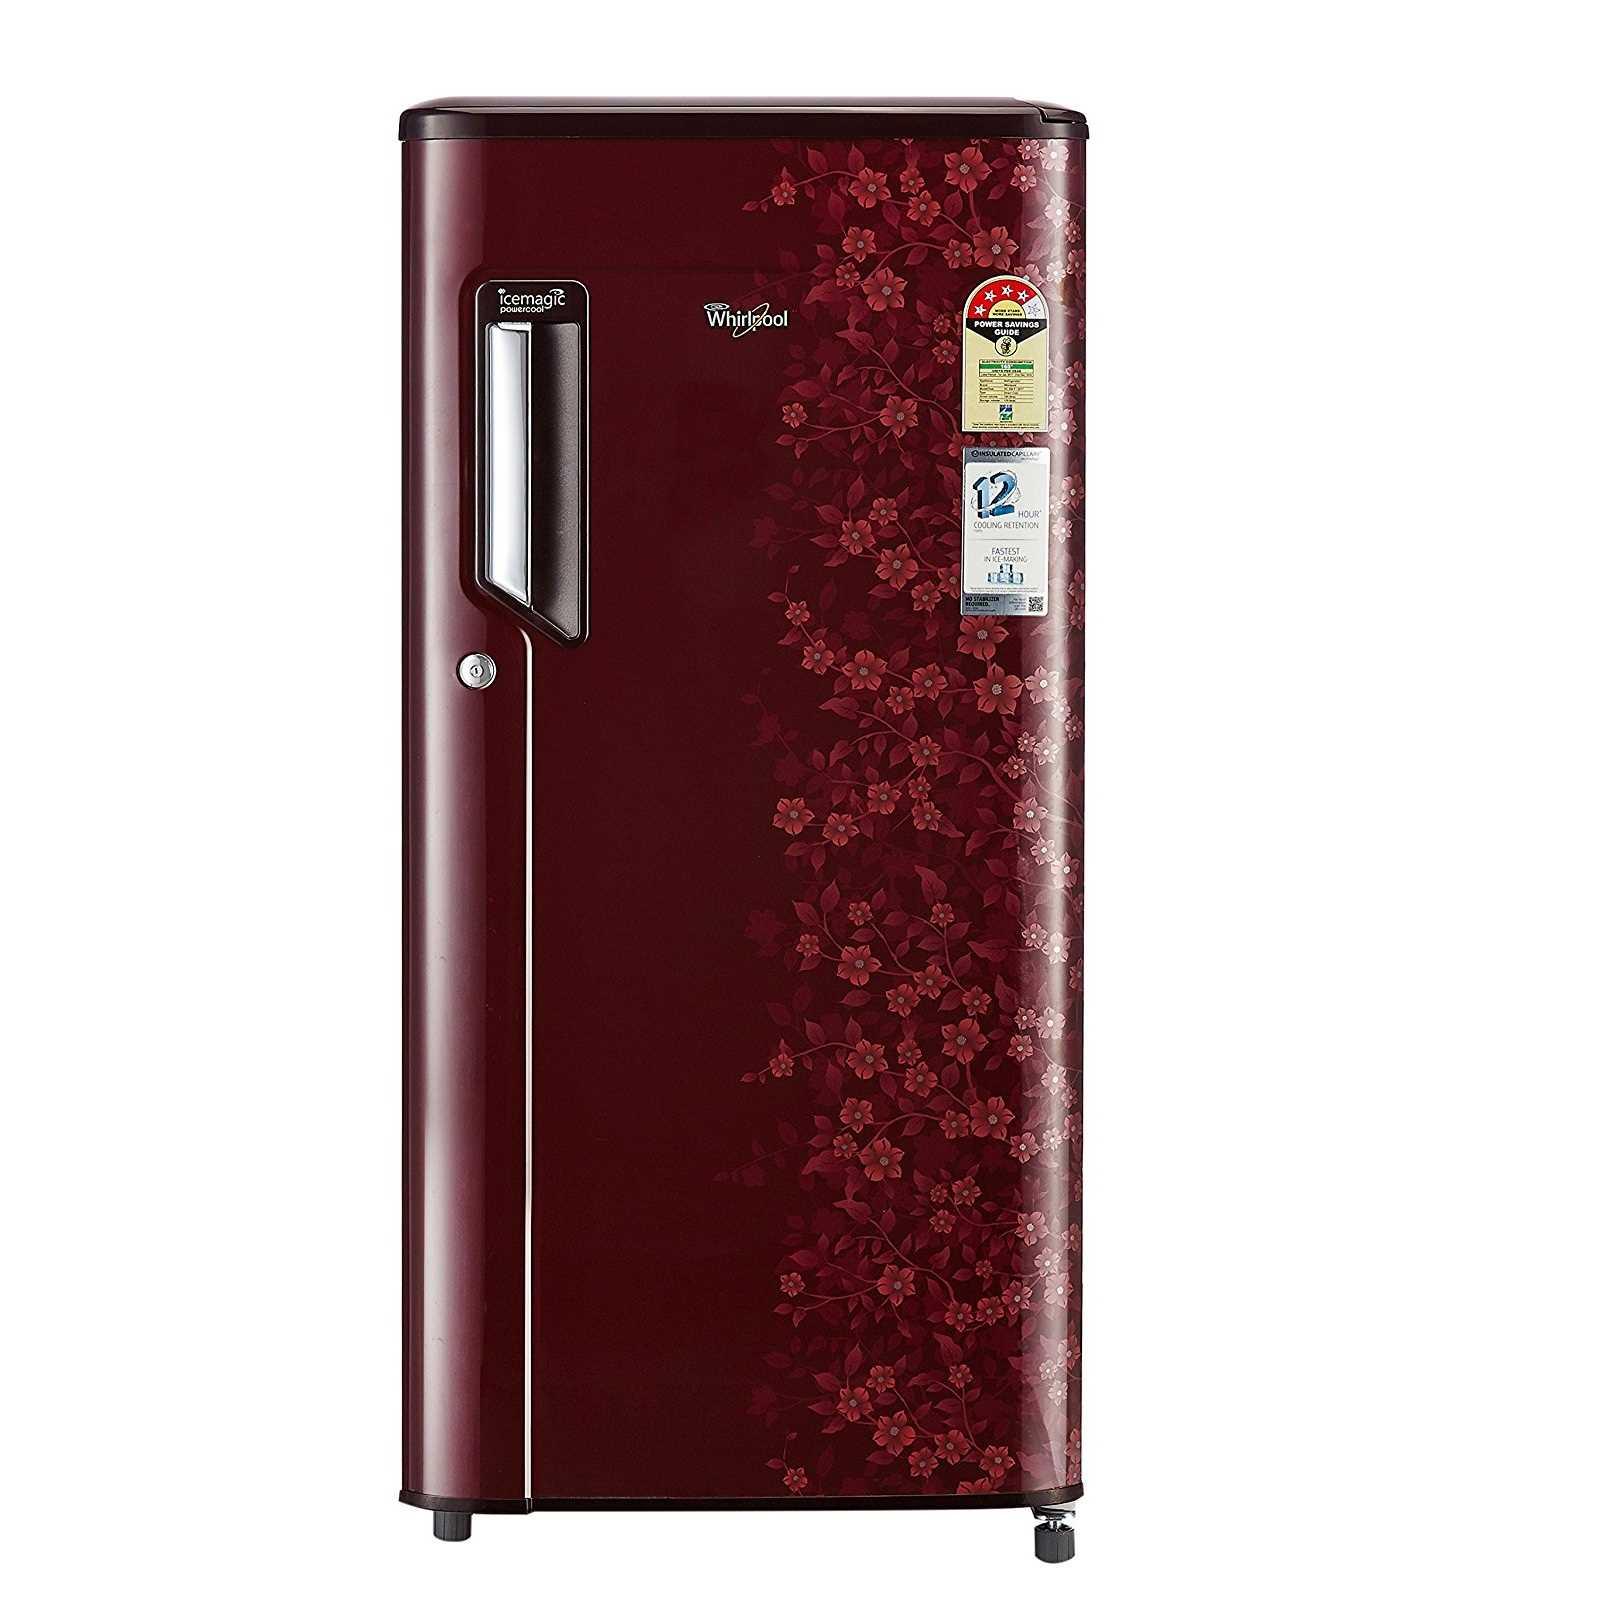 Whirlpool 215 IMPWCOOL PRM 4S 185 Litres Direct Cool Single Door Refrigerator